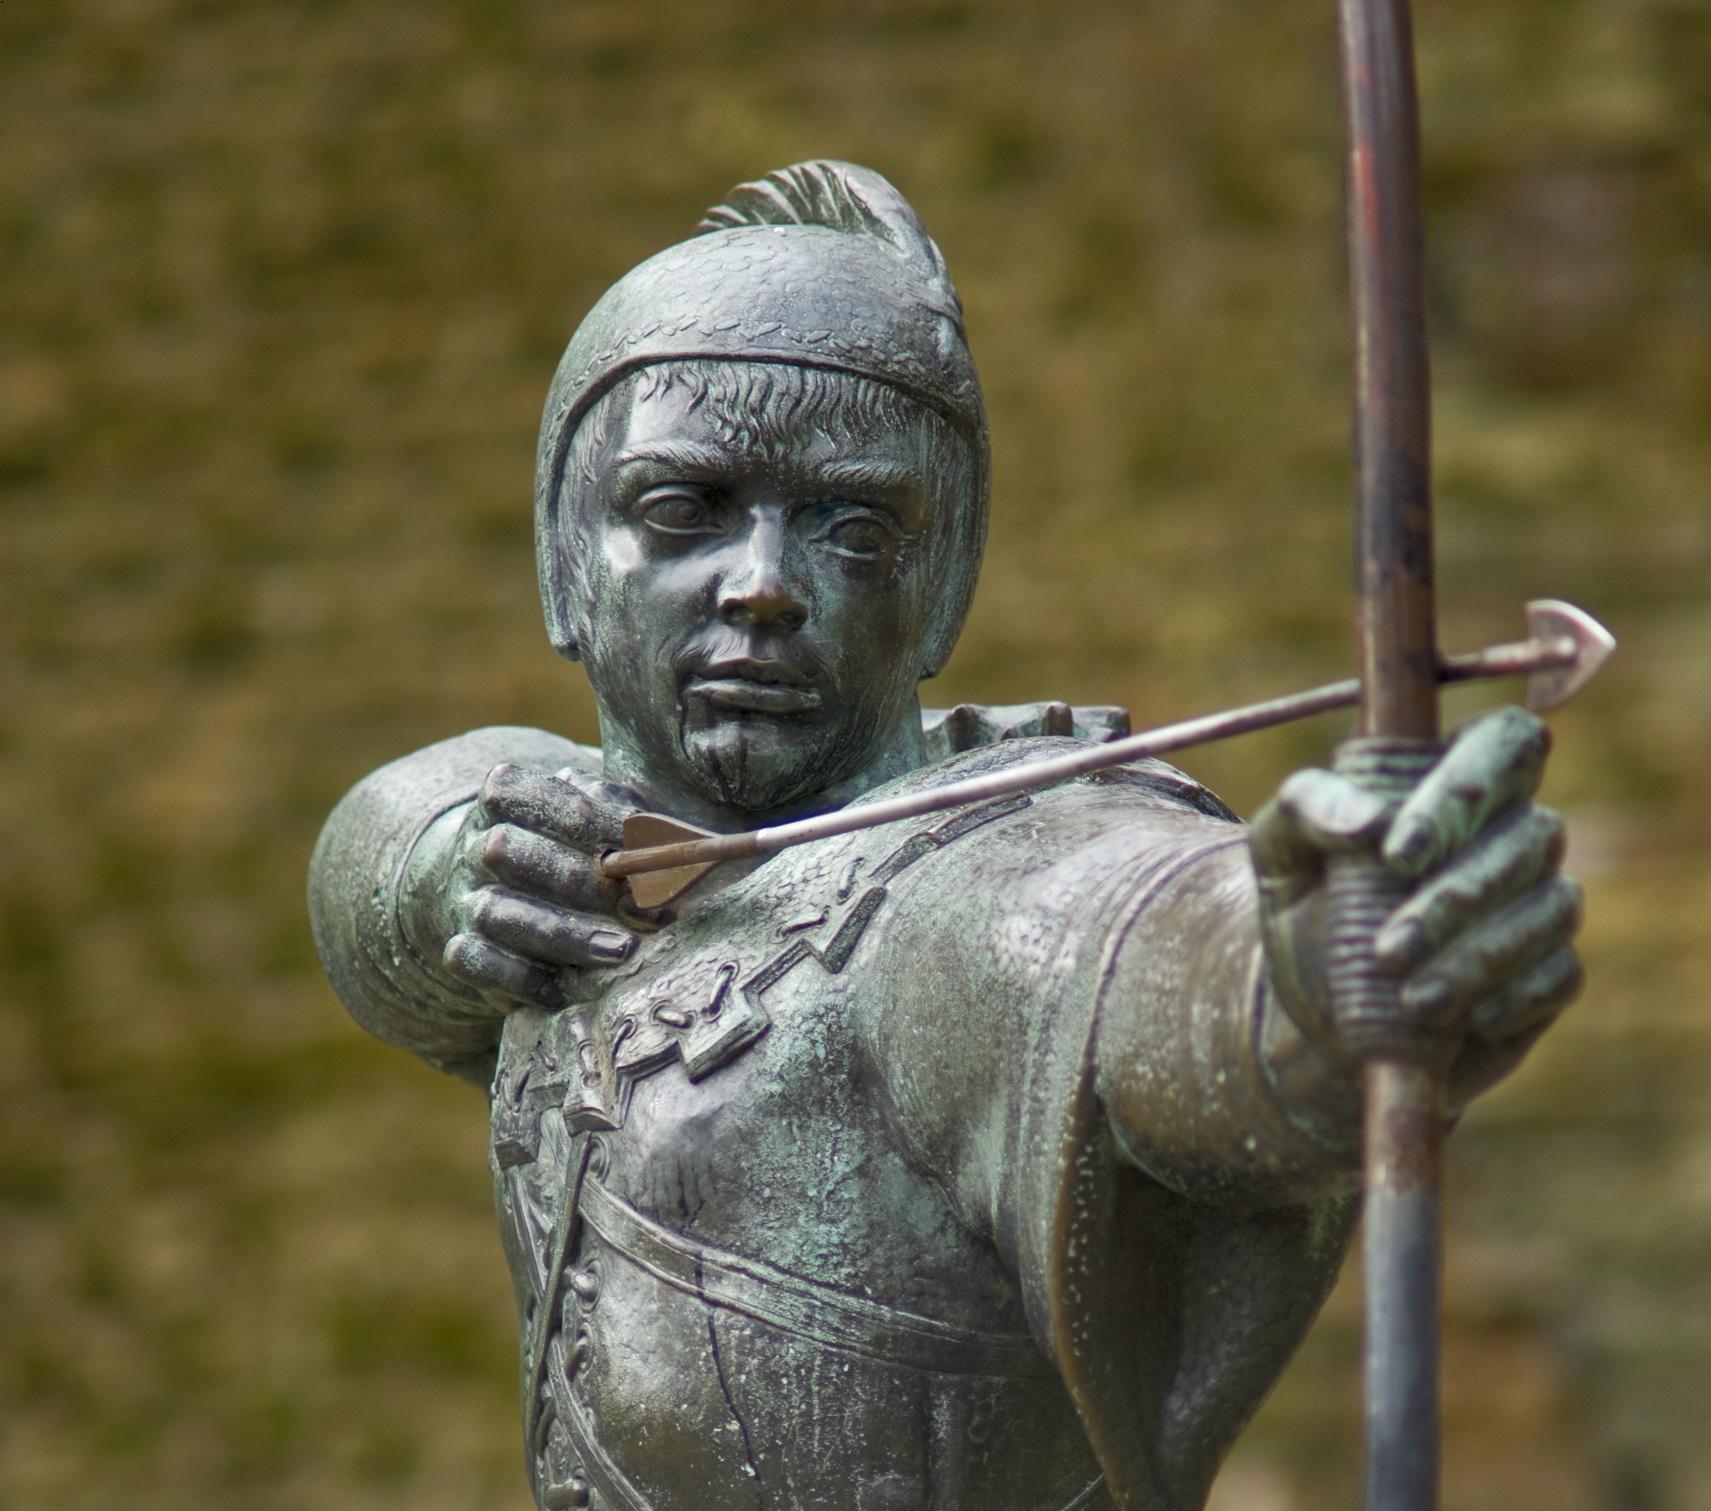 Statue of Robin Hood in Nottingham